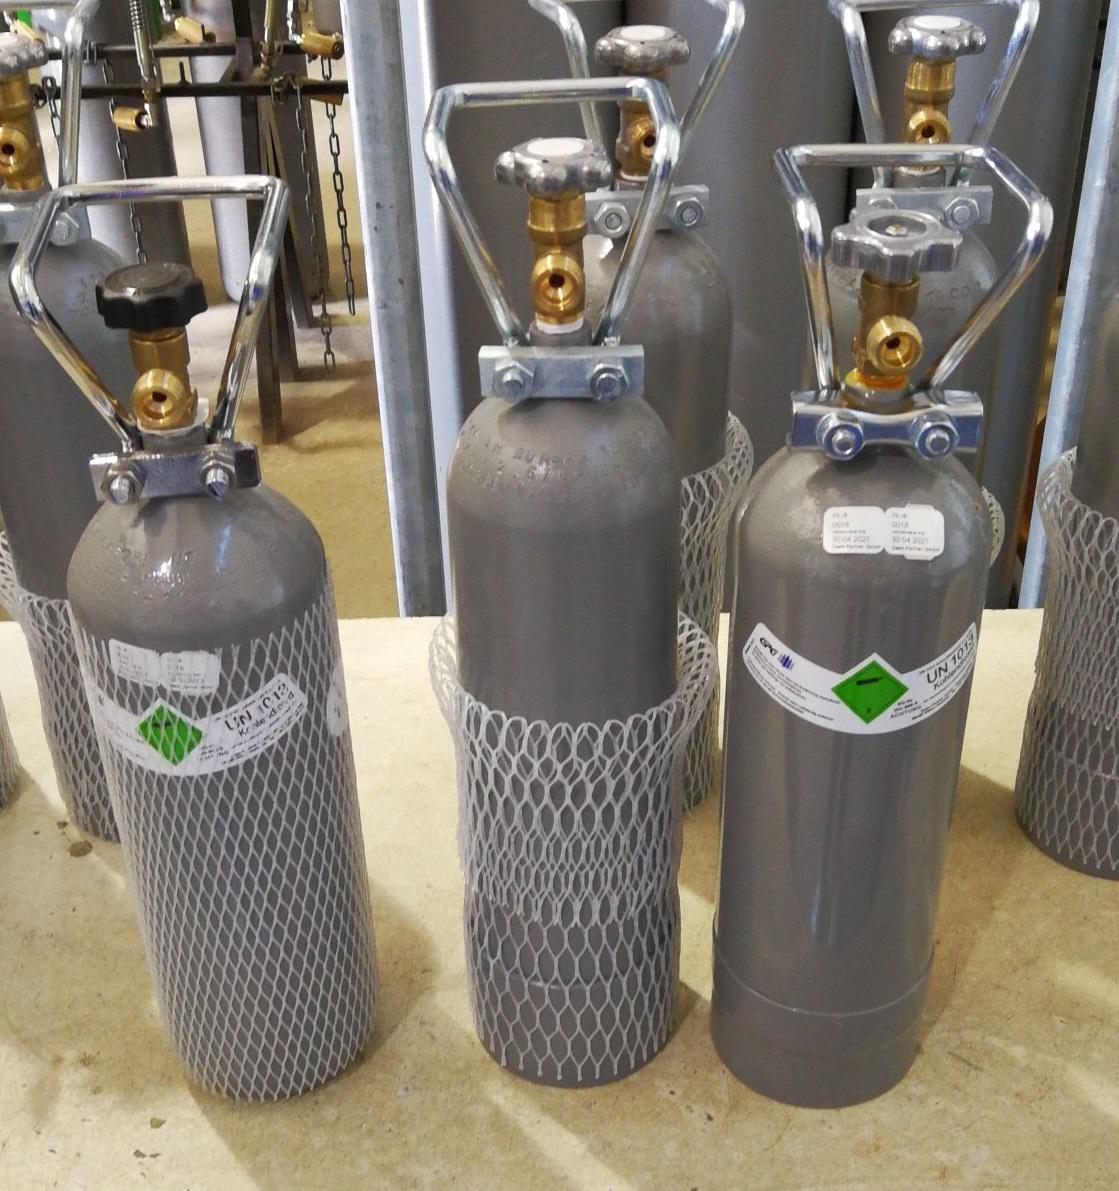 NSA Kohlendioxid CO2 Lebensmittel CO2 Kohlensäure 1,1 KG Füllung für NSA Flasche